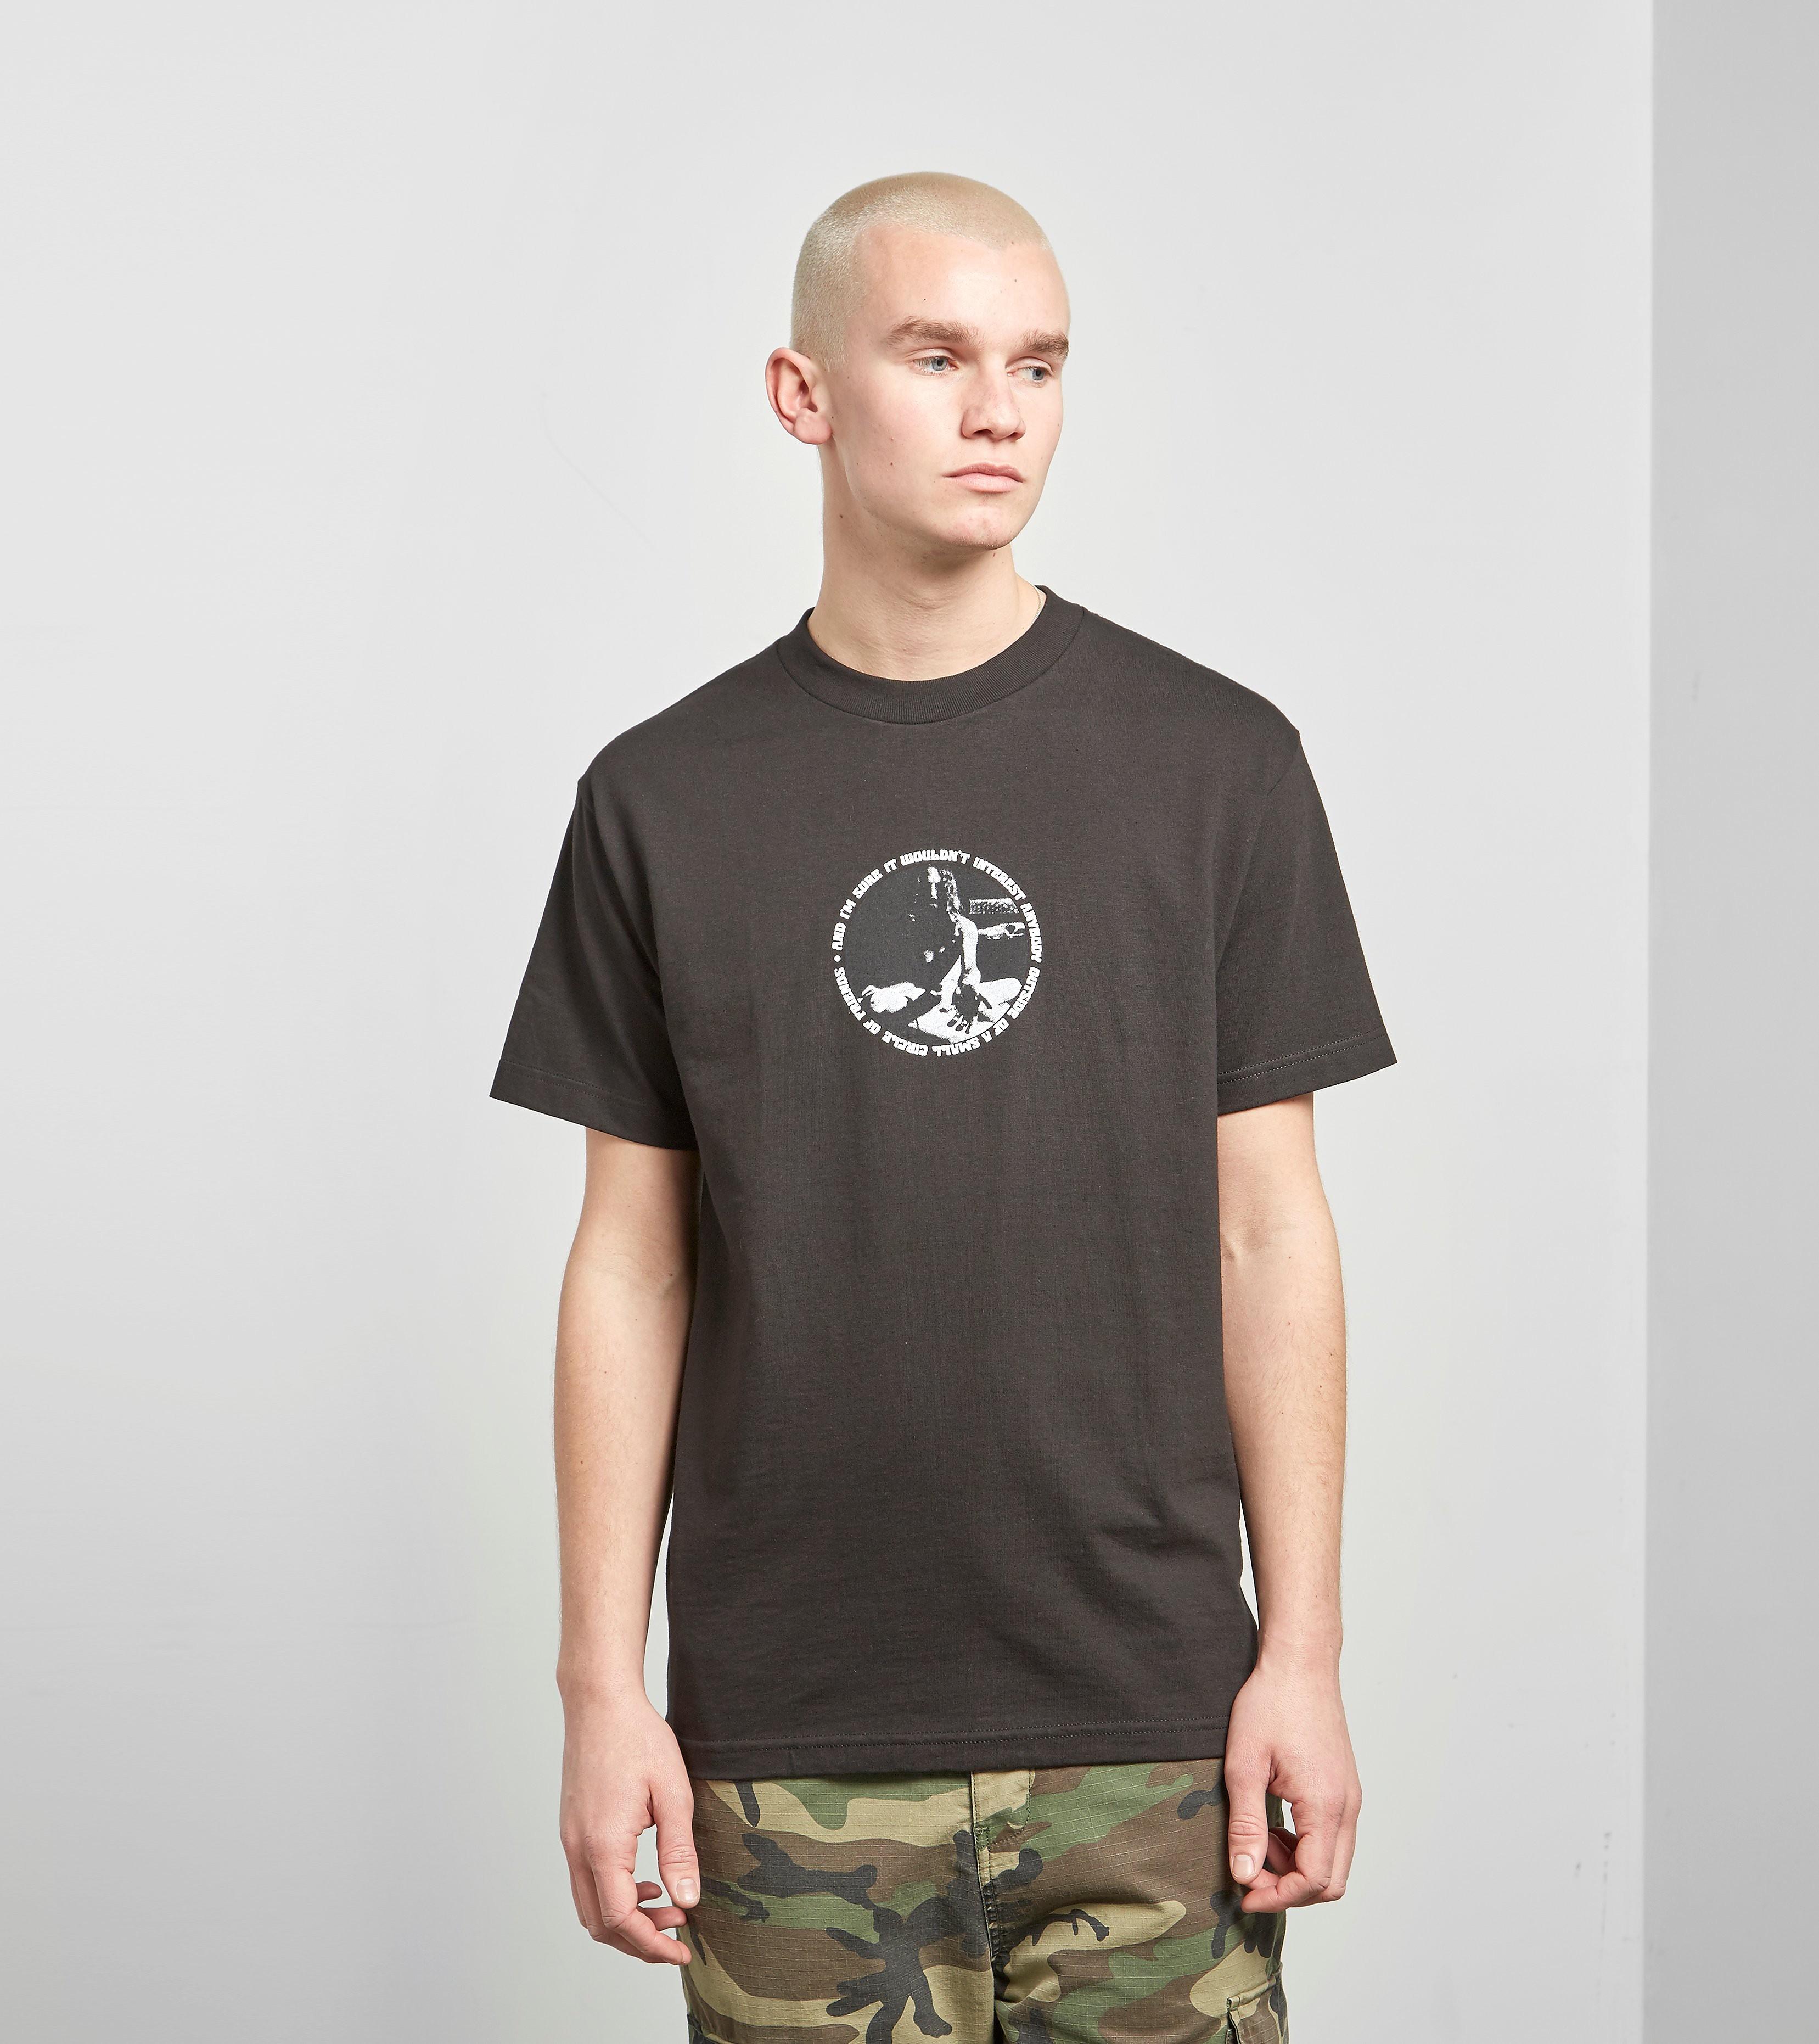 Foulplay Heavens Gate T-Shirt